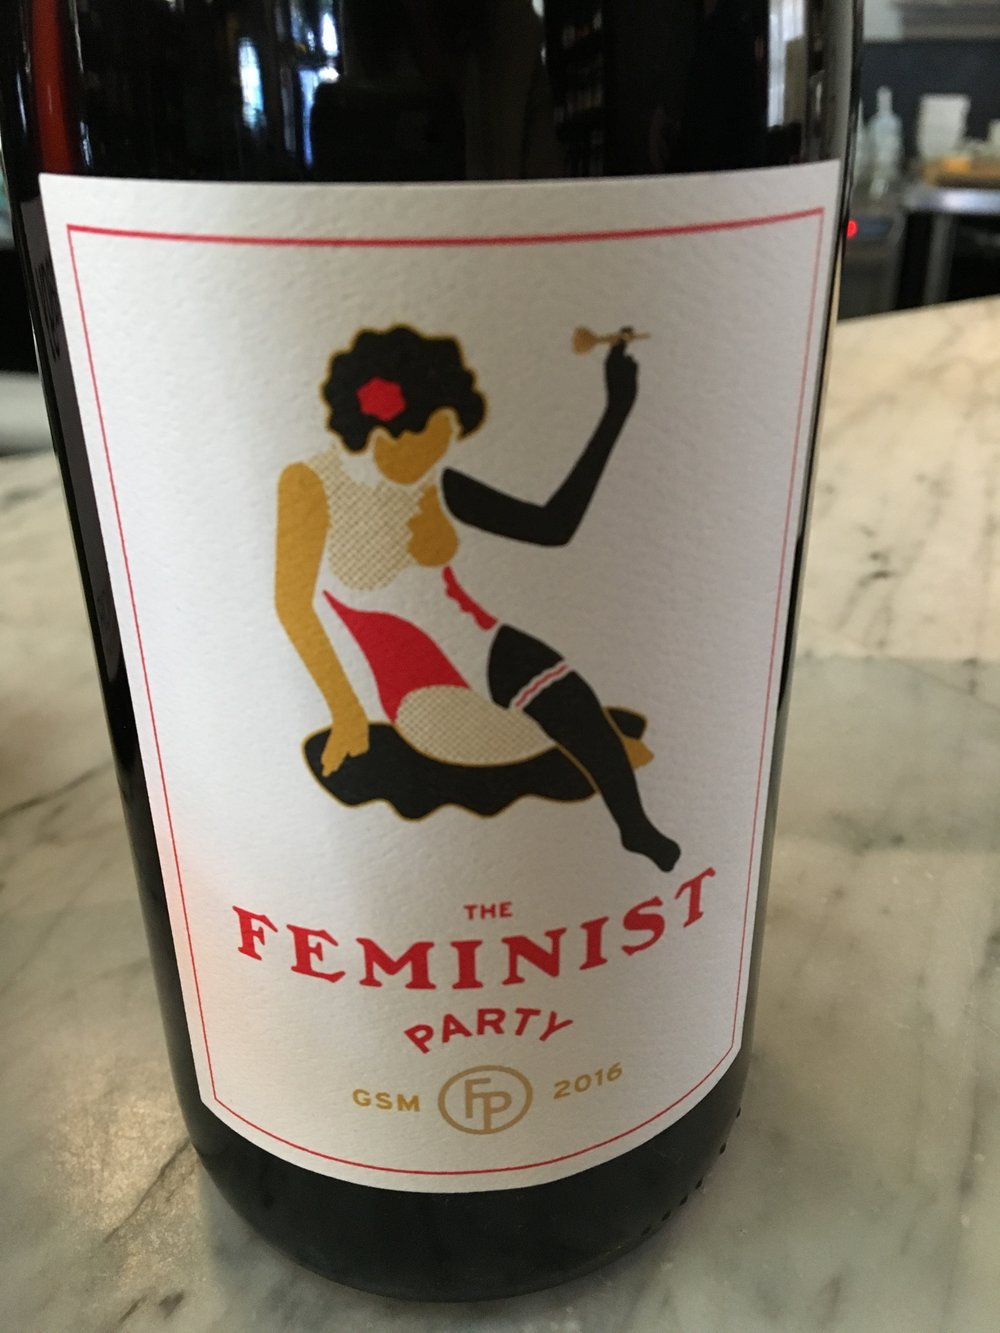 Feminist Party Madjevski.JPG